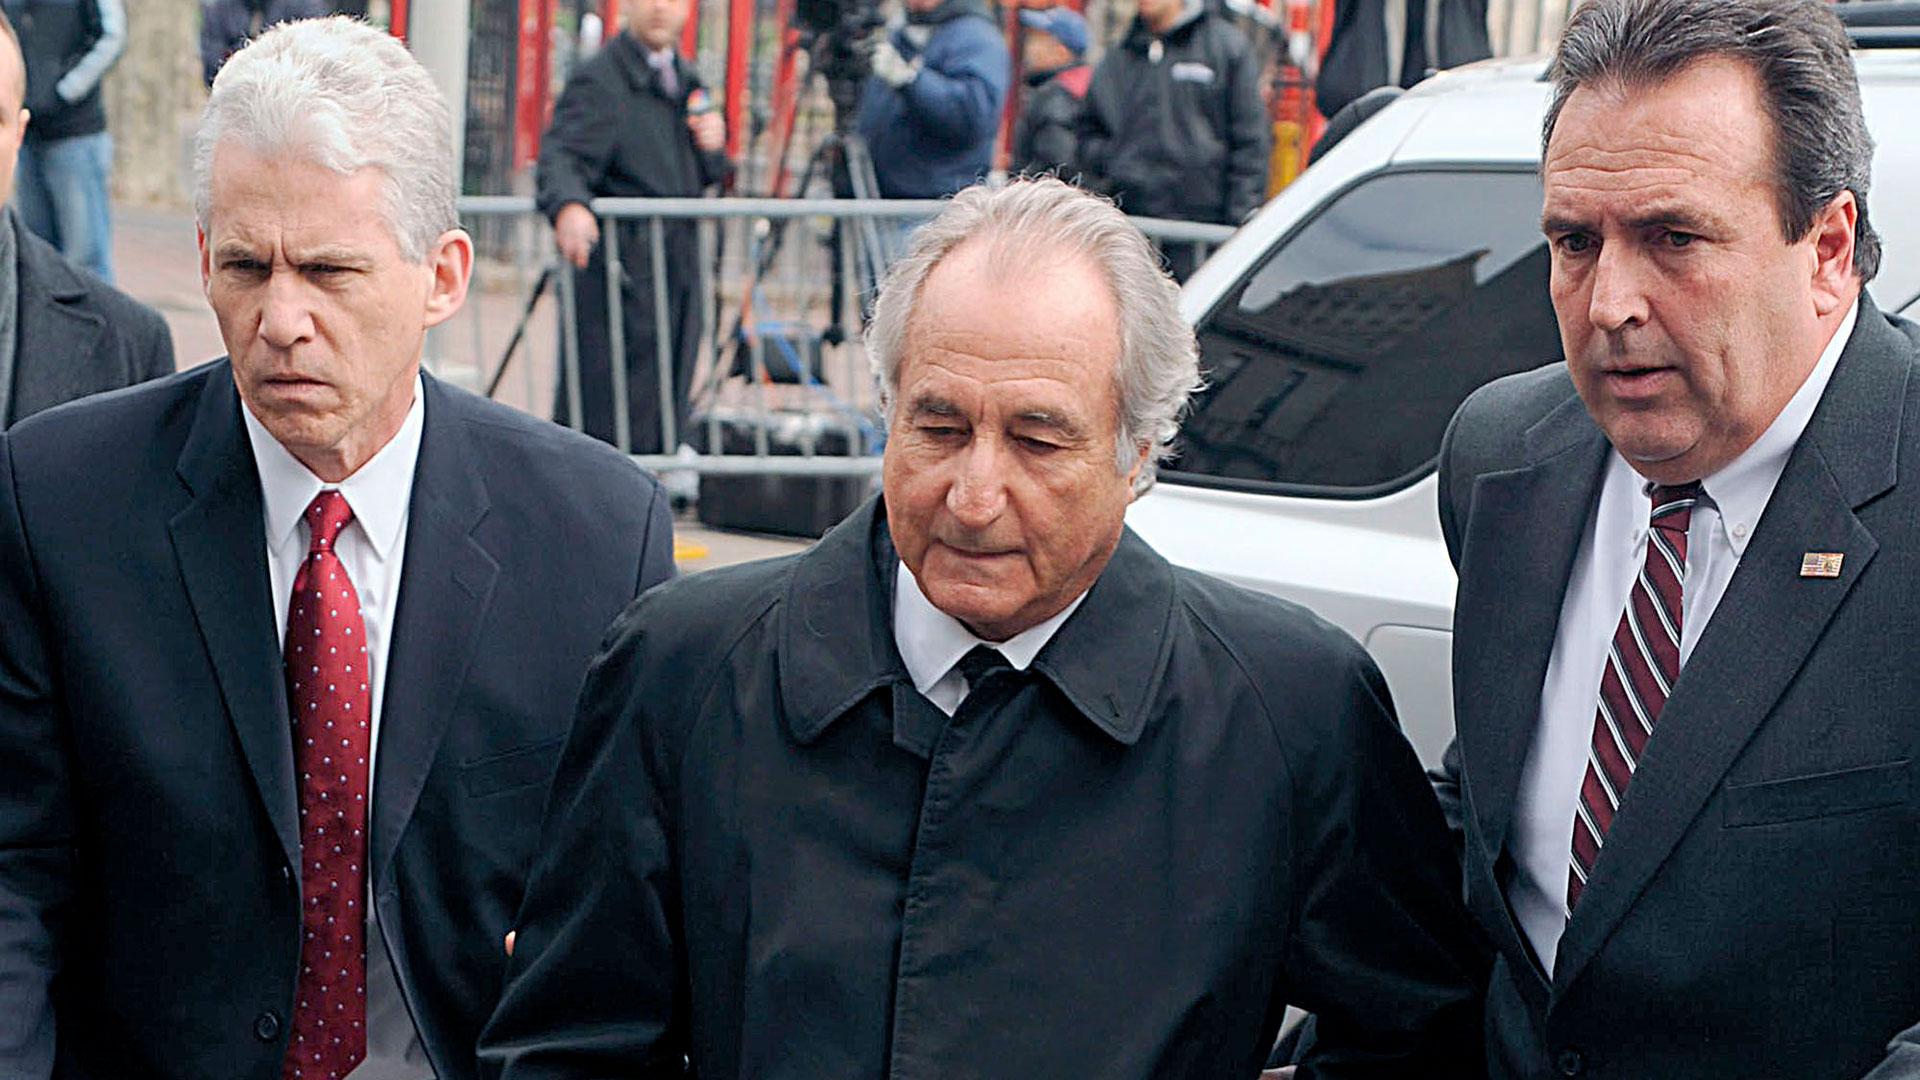 Murió Bernie Madoff, el mayor estafador de la historia de Wall Street